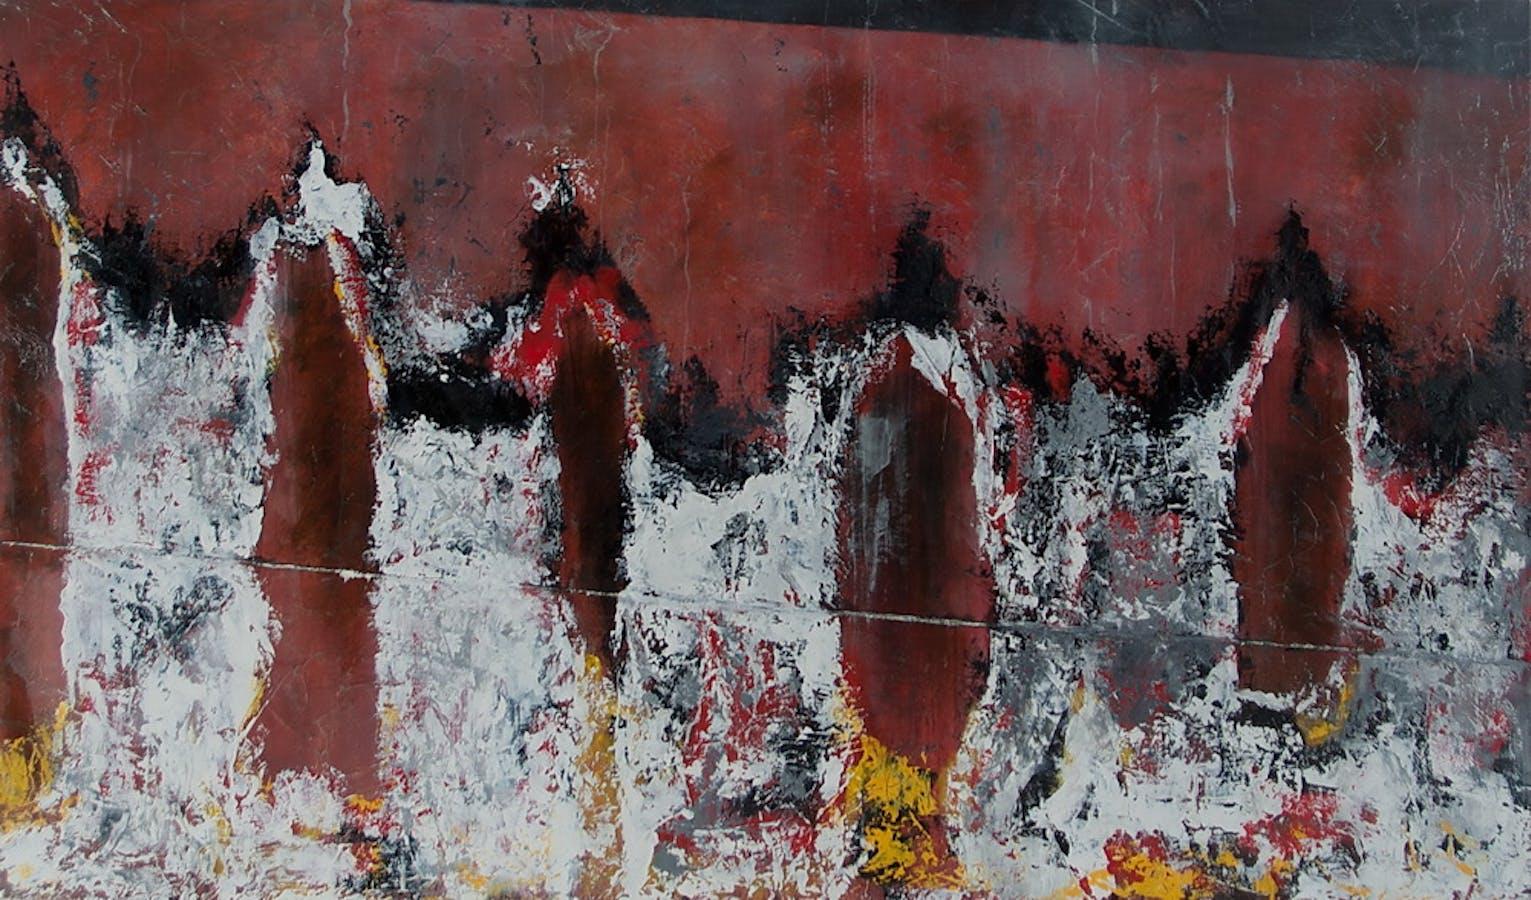 Painting by Melinda Hannigan